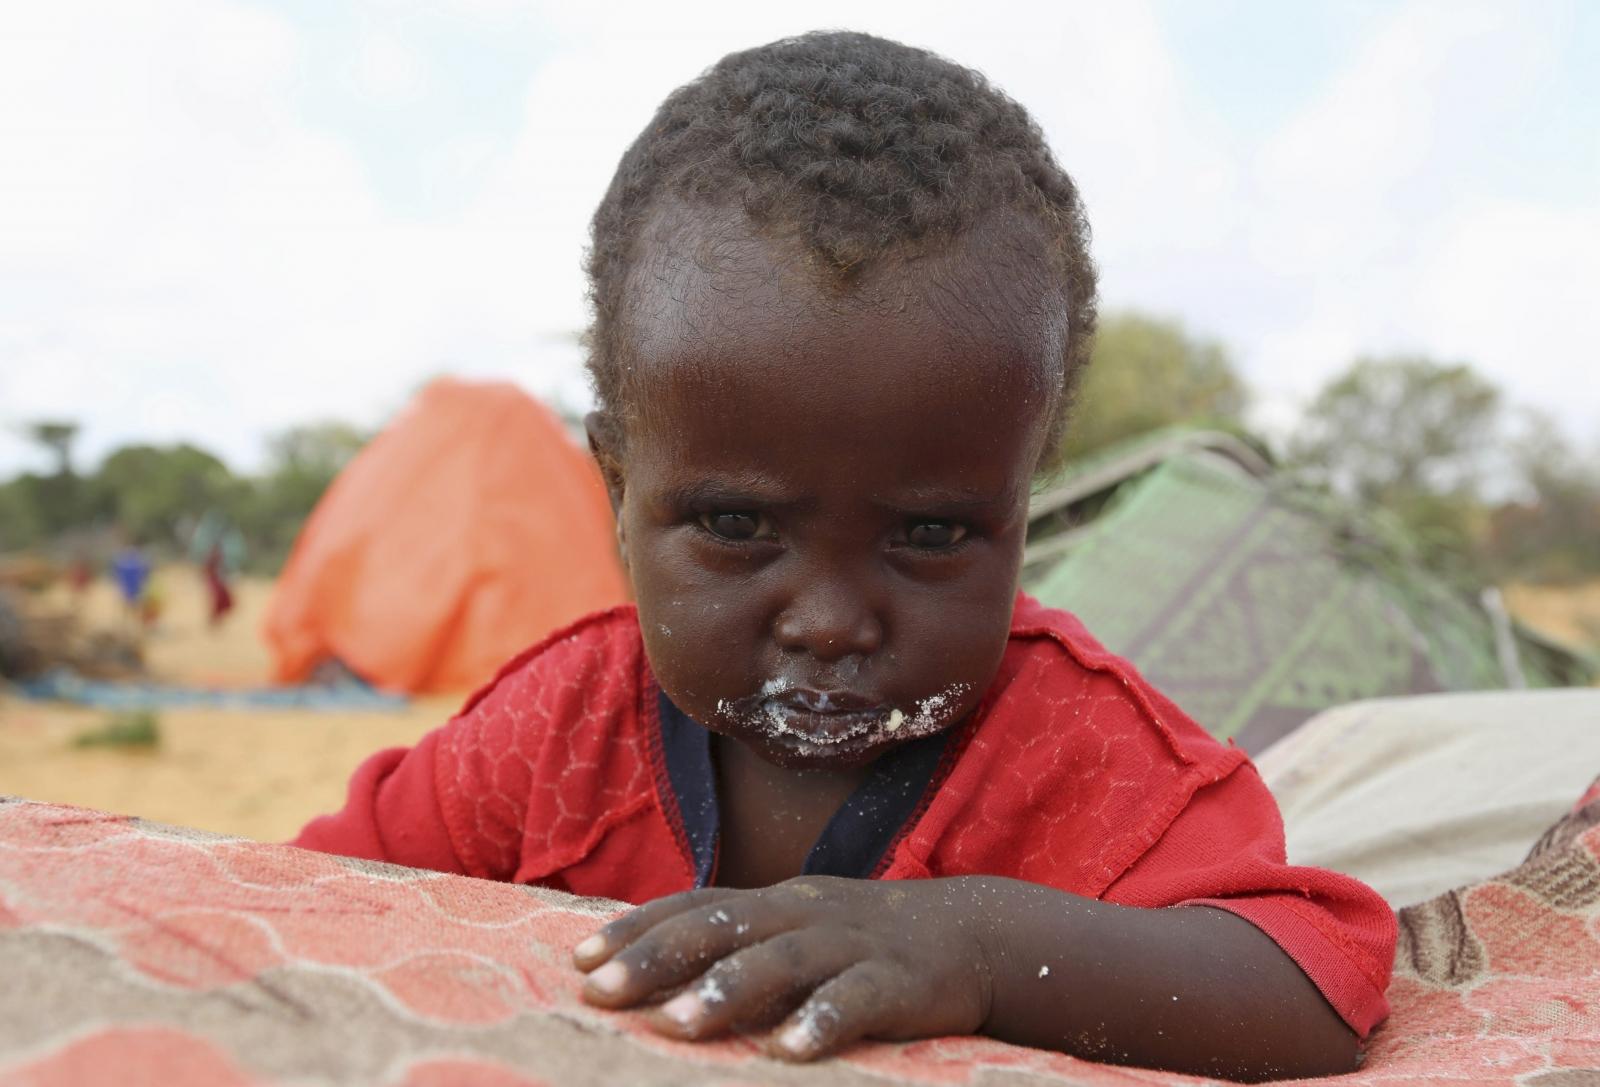 Somalian poverty